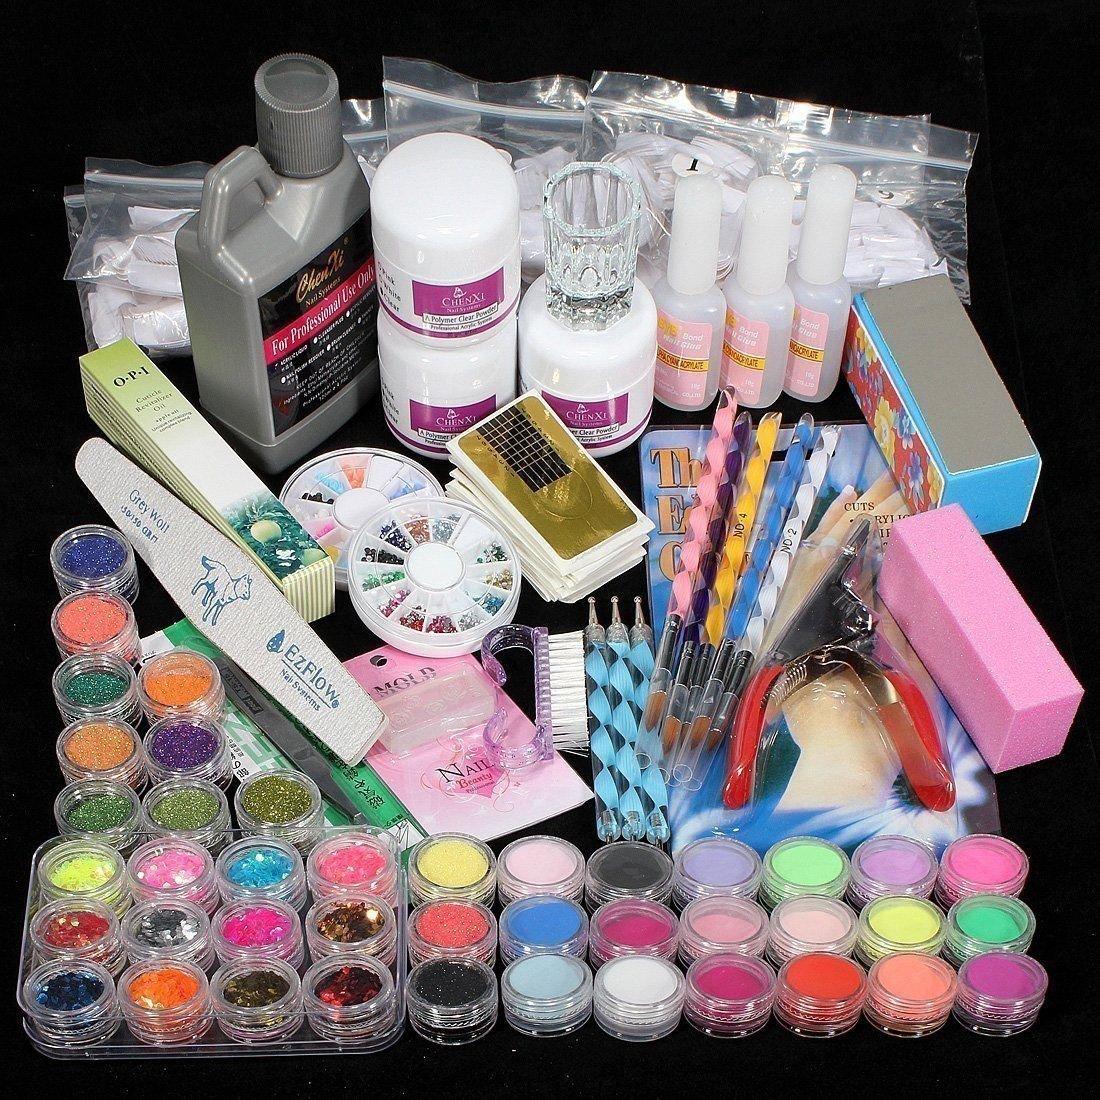 42 Acrylic Powder Liquid Brush Glitter Clipper Primer File Nail Art Tips Set Kit G for U